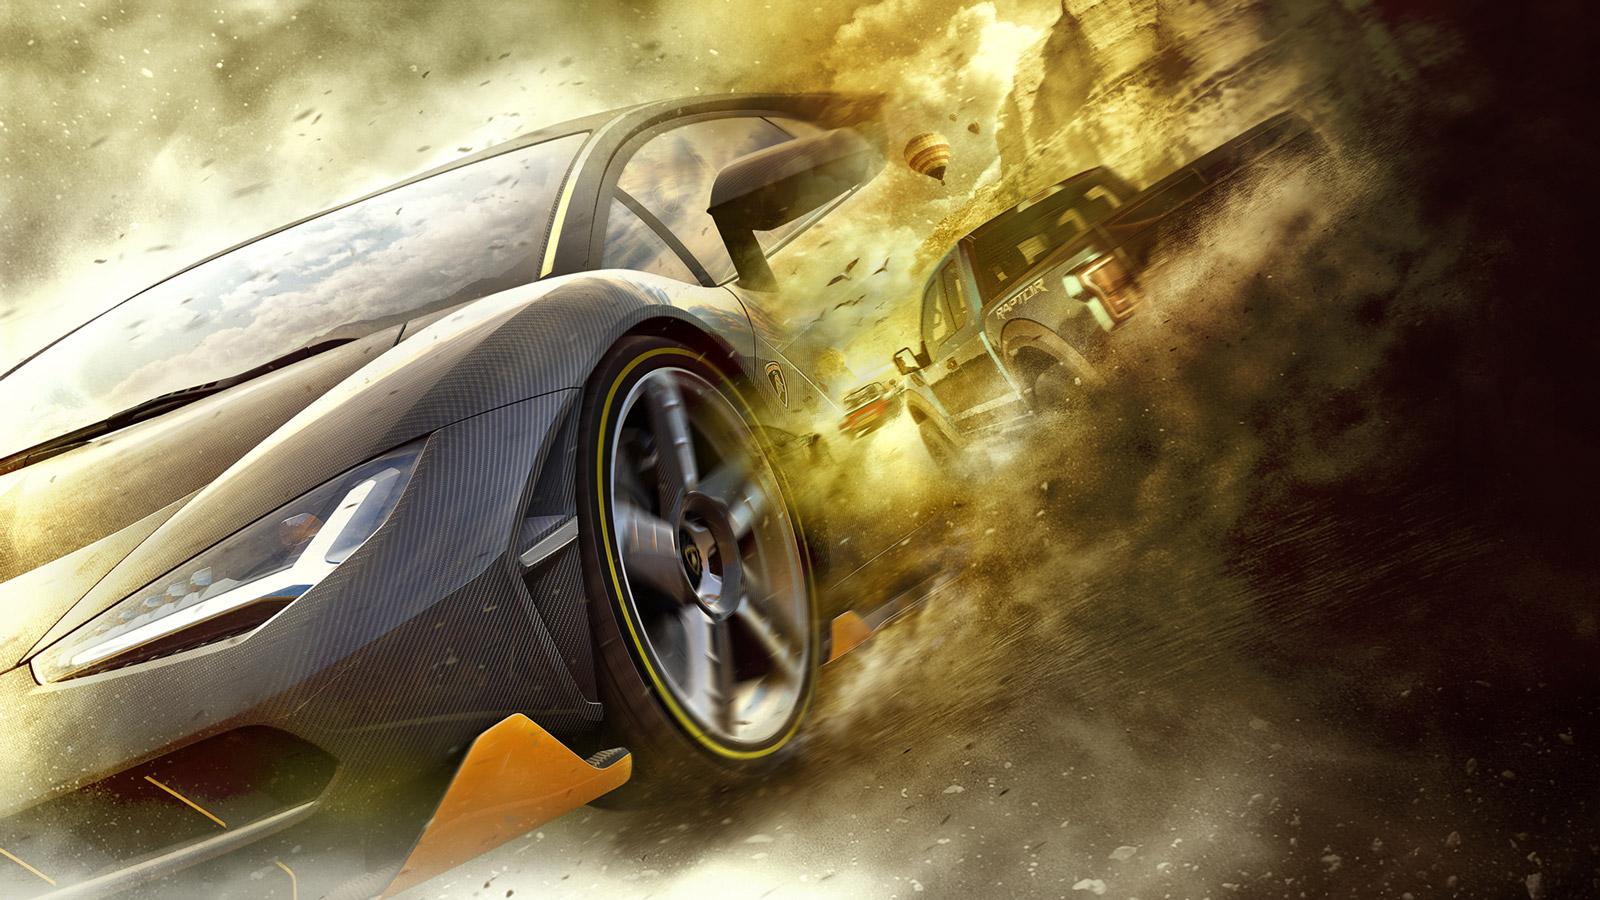 Forza Horizon 3 Wallpaper in 1600x900